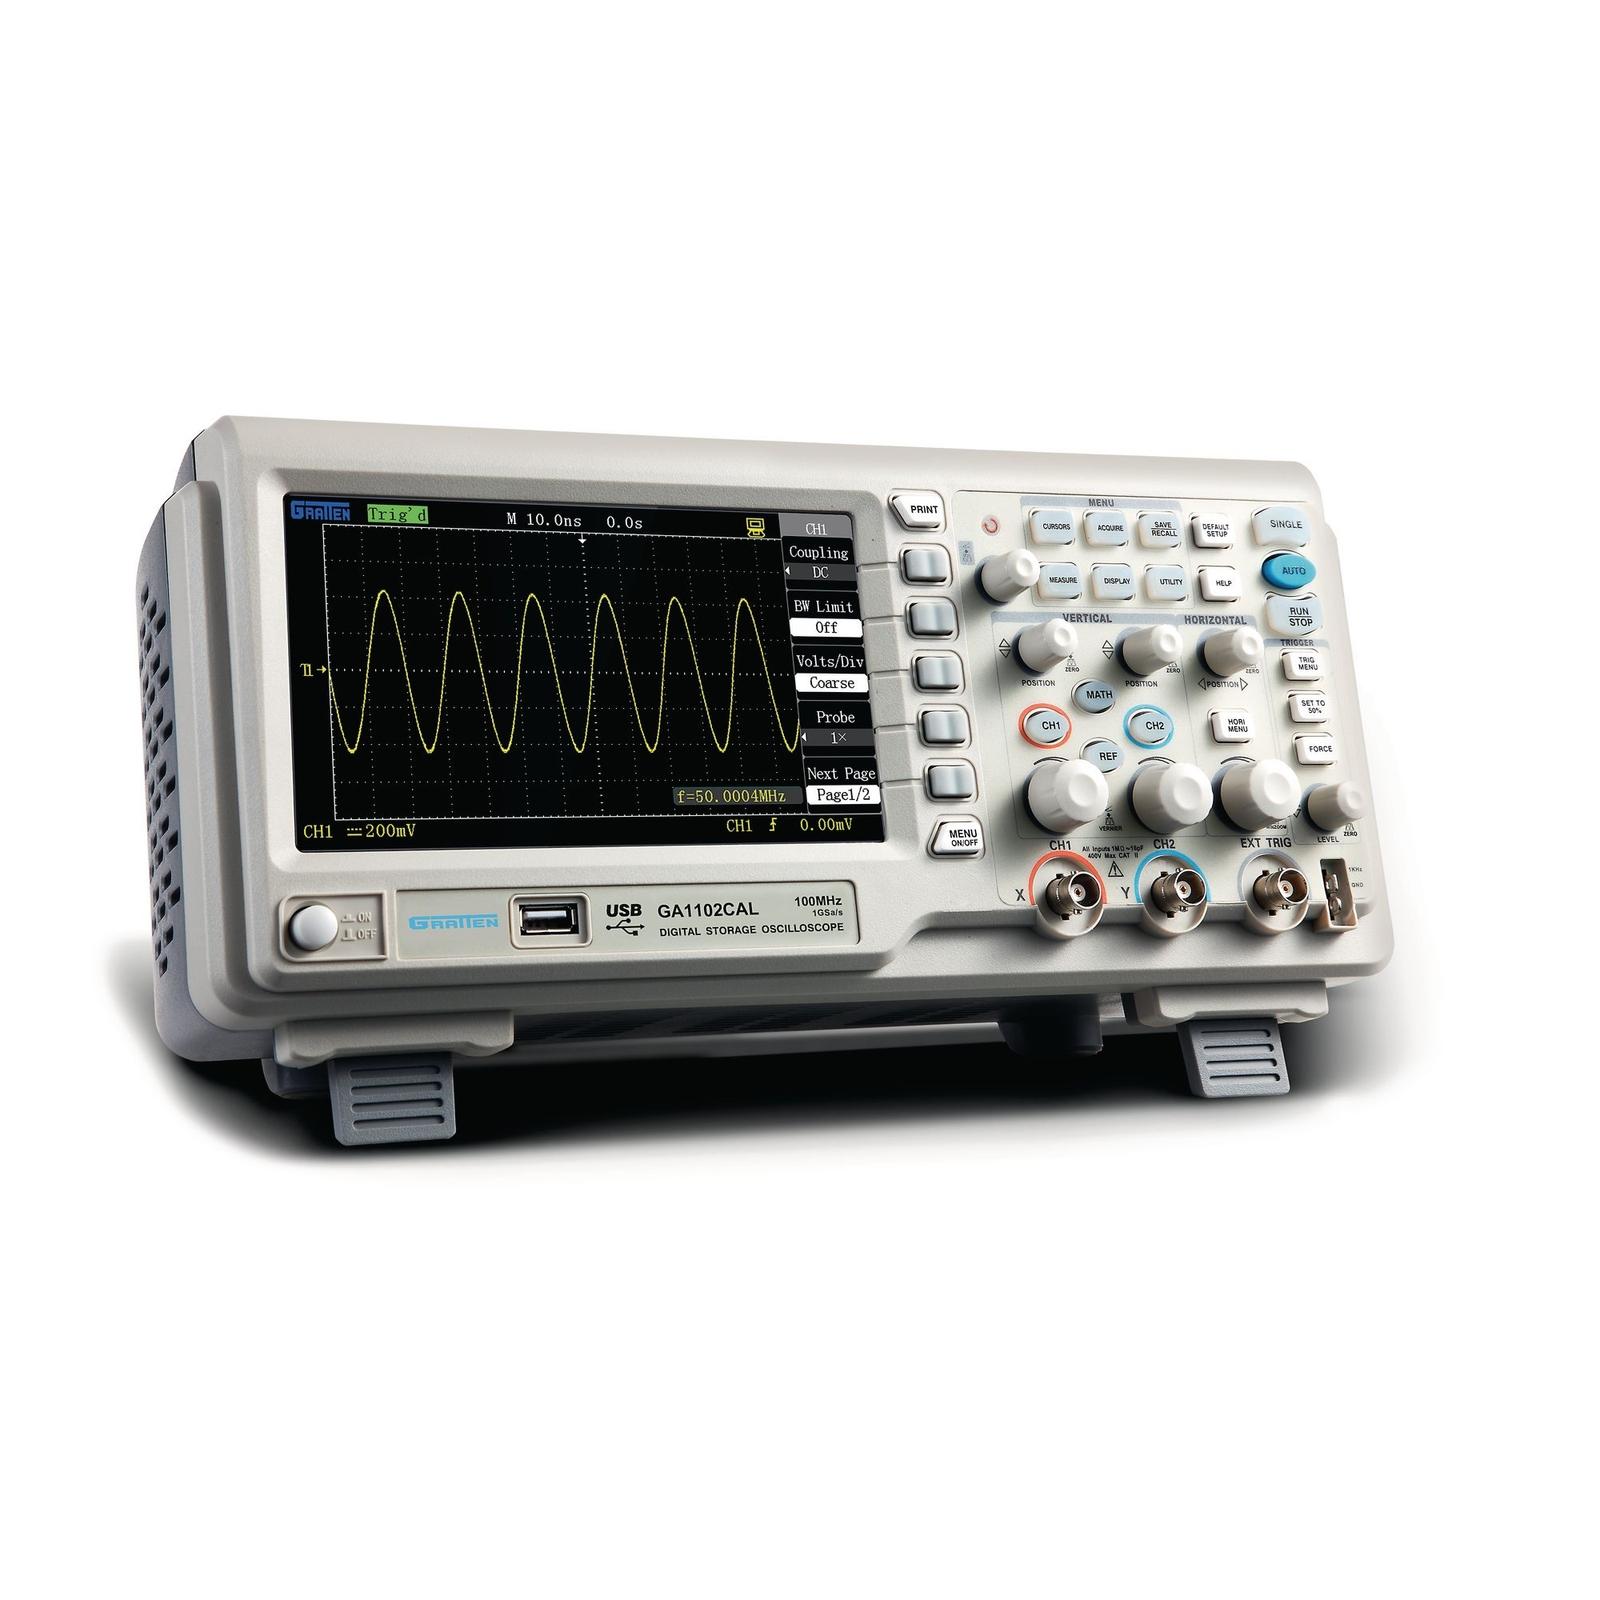 Oscilloscope Pulse Measurement : Mhz digital oscilloscope philip harris